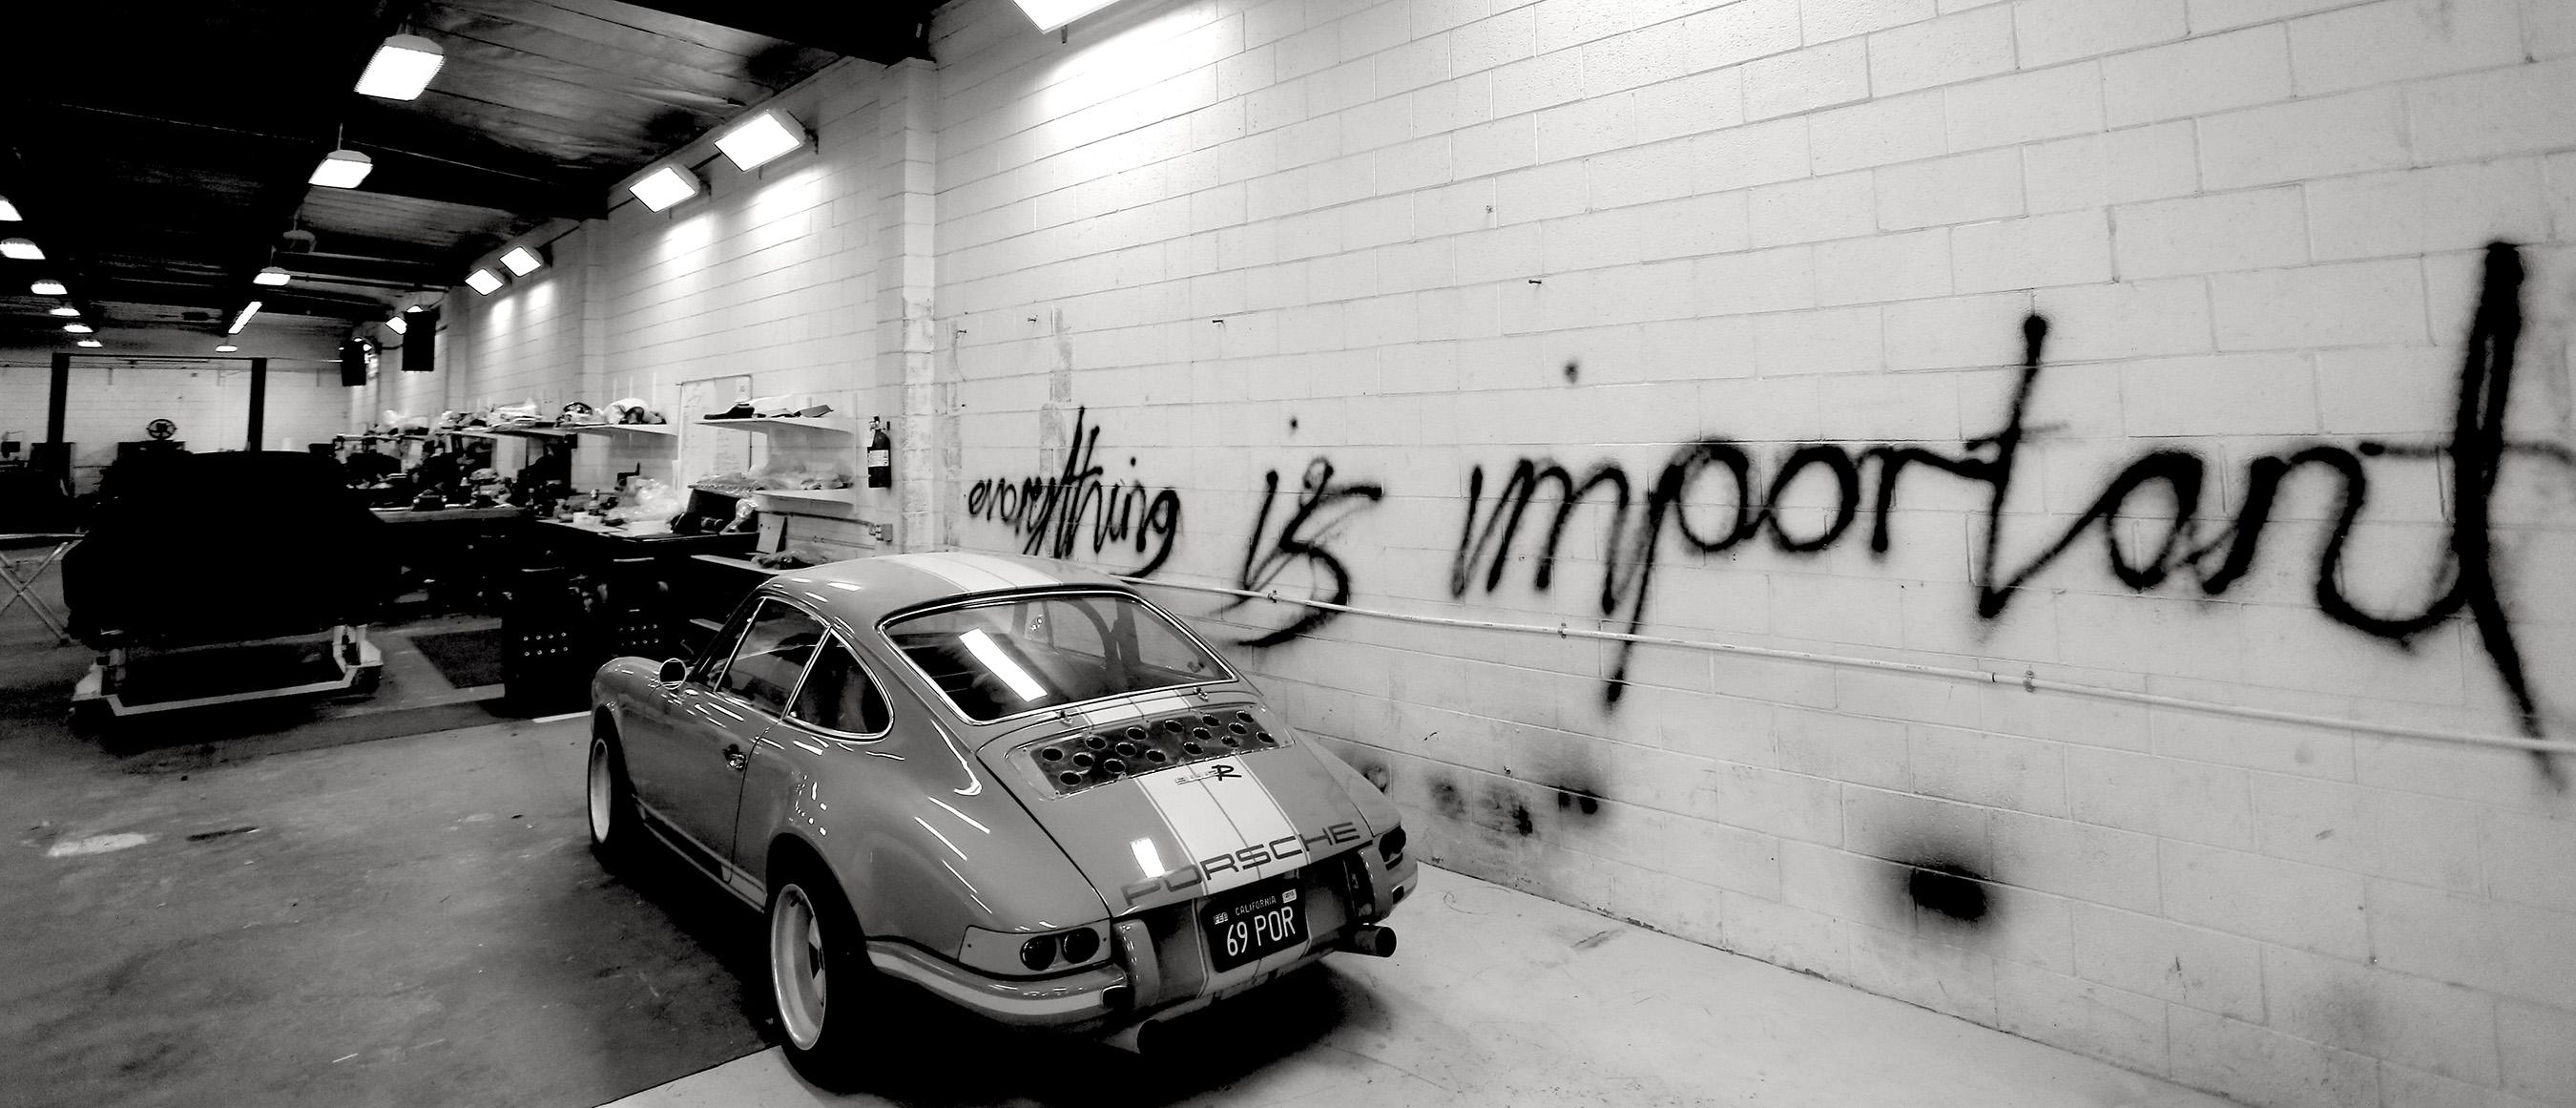 Rob Dickinson's original 1969 Porsche 911E 'Brown Bomber' was the genesis for creating Singer Vehicle Design, ...